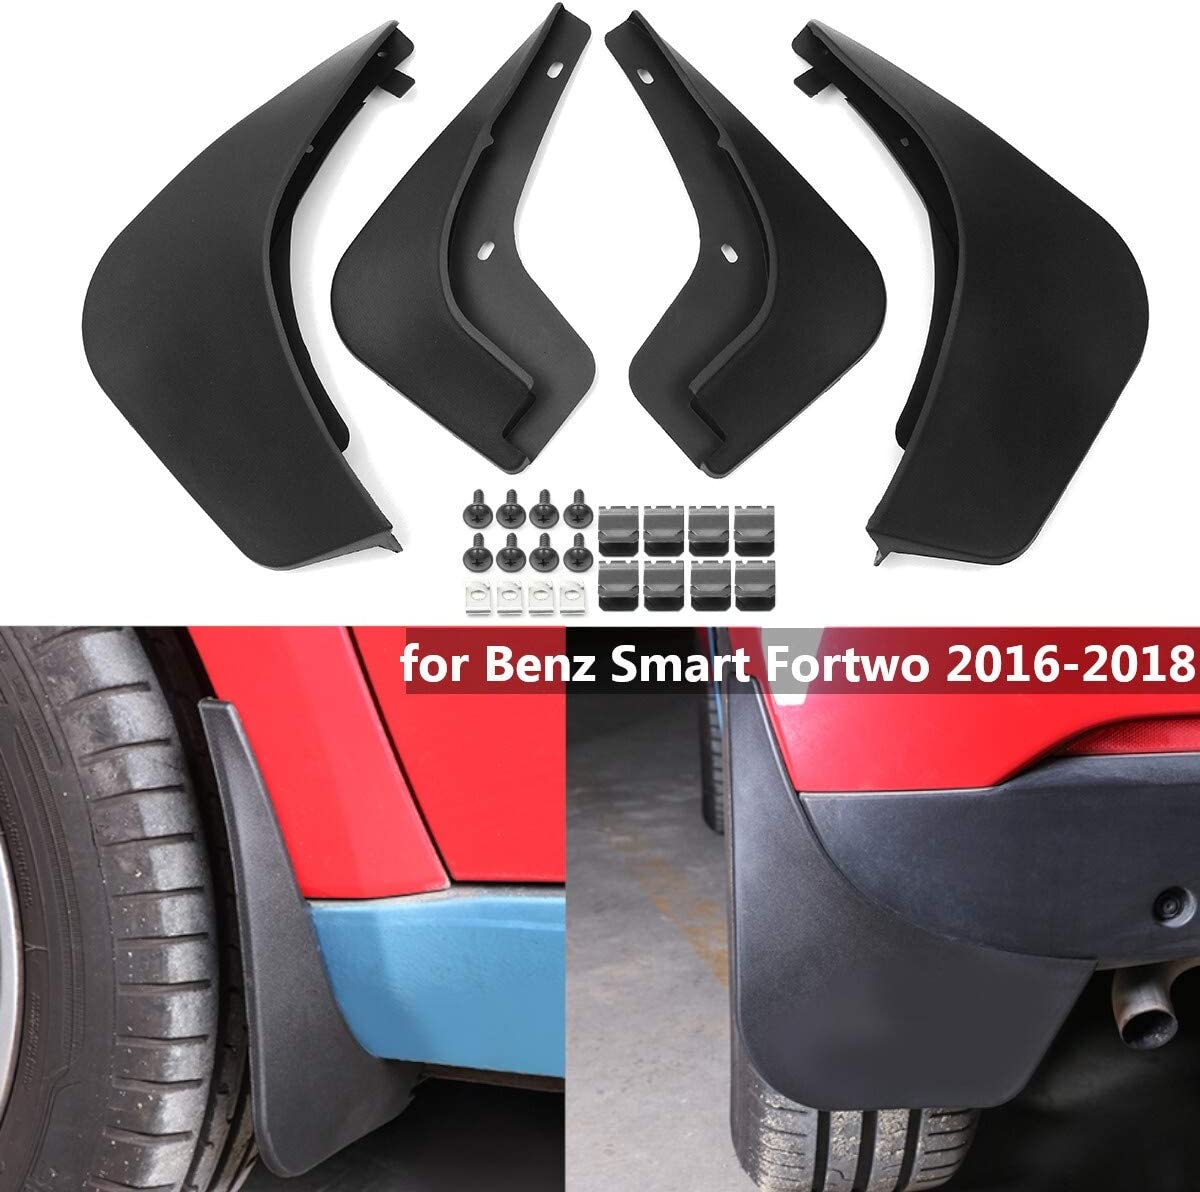 Popular products IJEOKDHDUW Car Mud Flaps Mudflaps Guards Mudguar Splash Flap Max 88% OFF